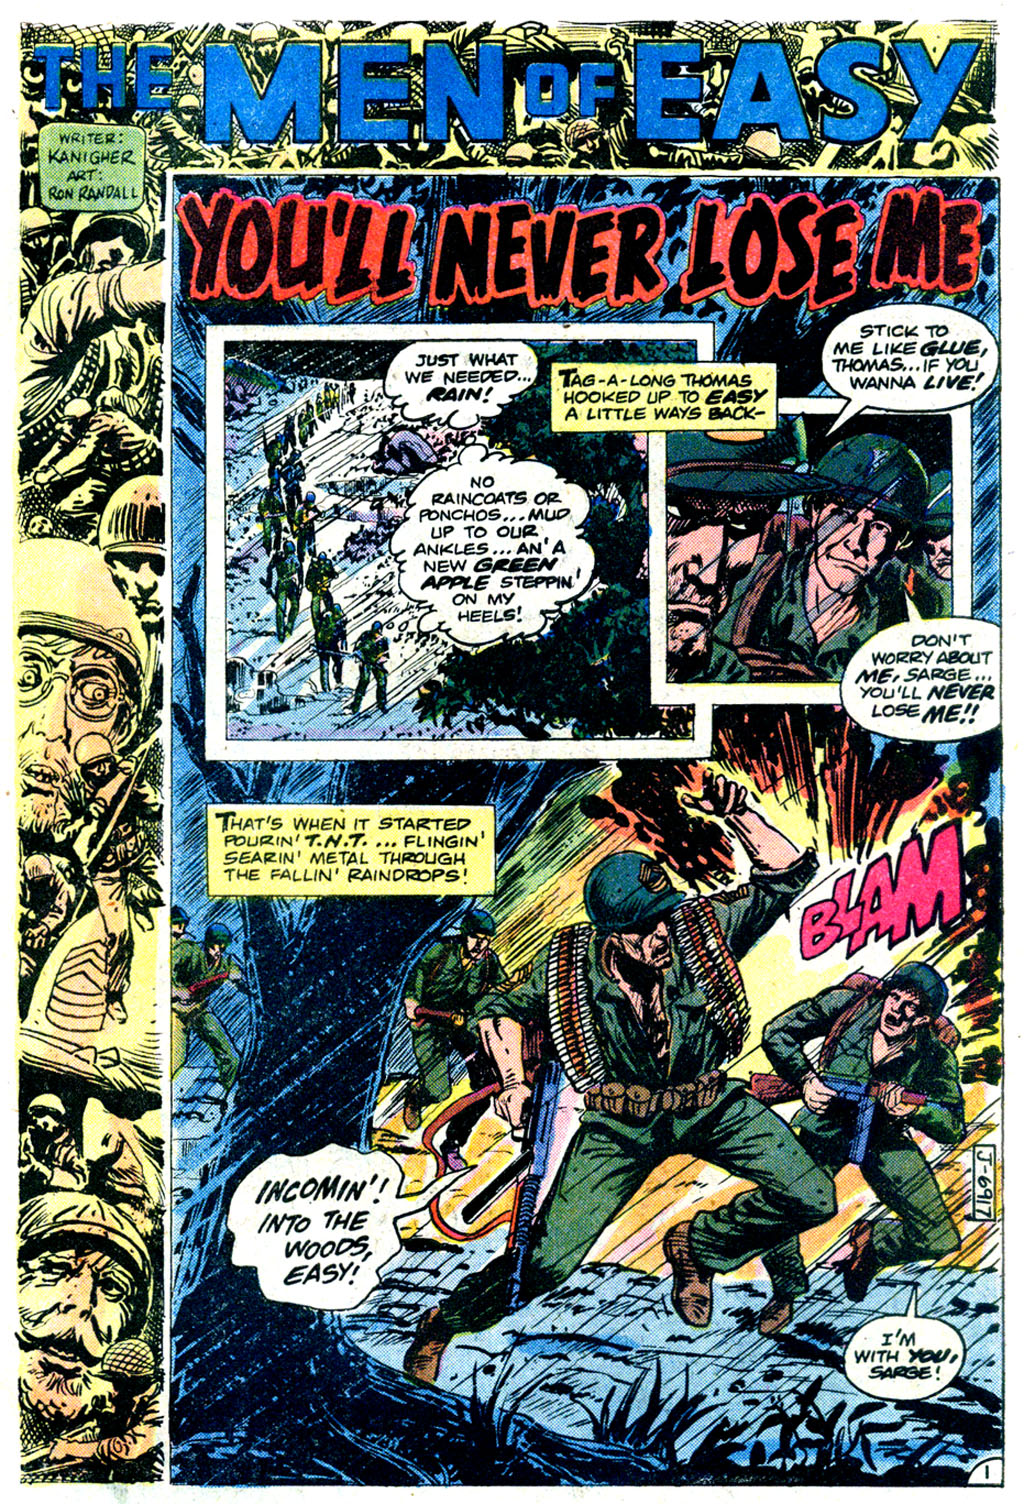 Read online Sgt. Rock comic -  Issue #354 - 25